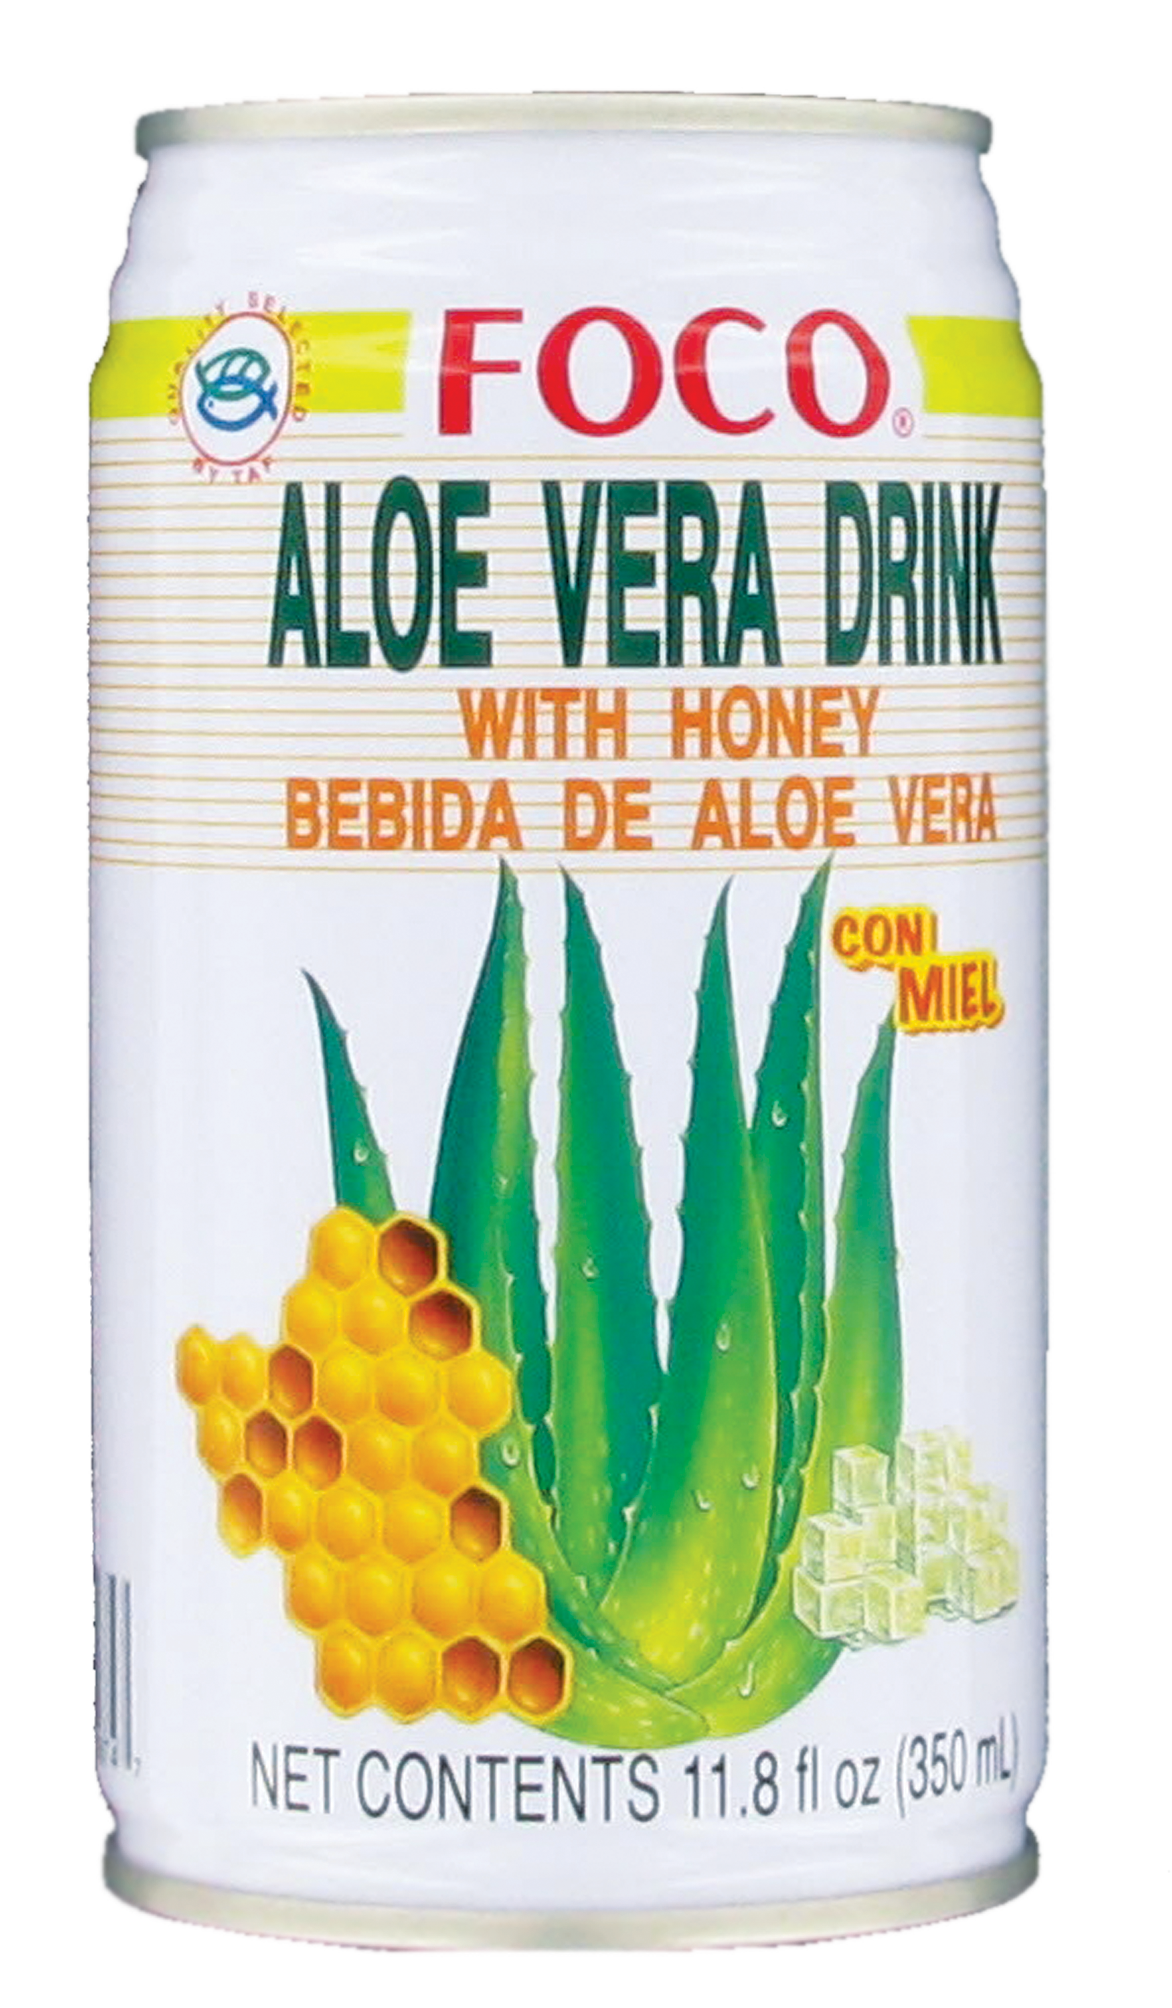 Boisson au jus d'aloe vera et miel, Foco (350 ml)